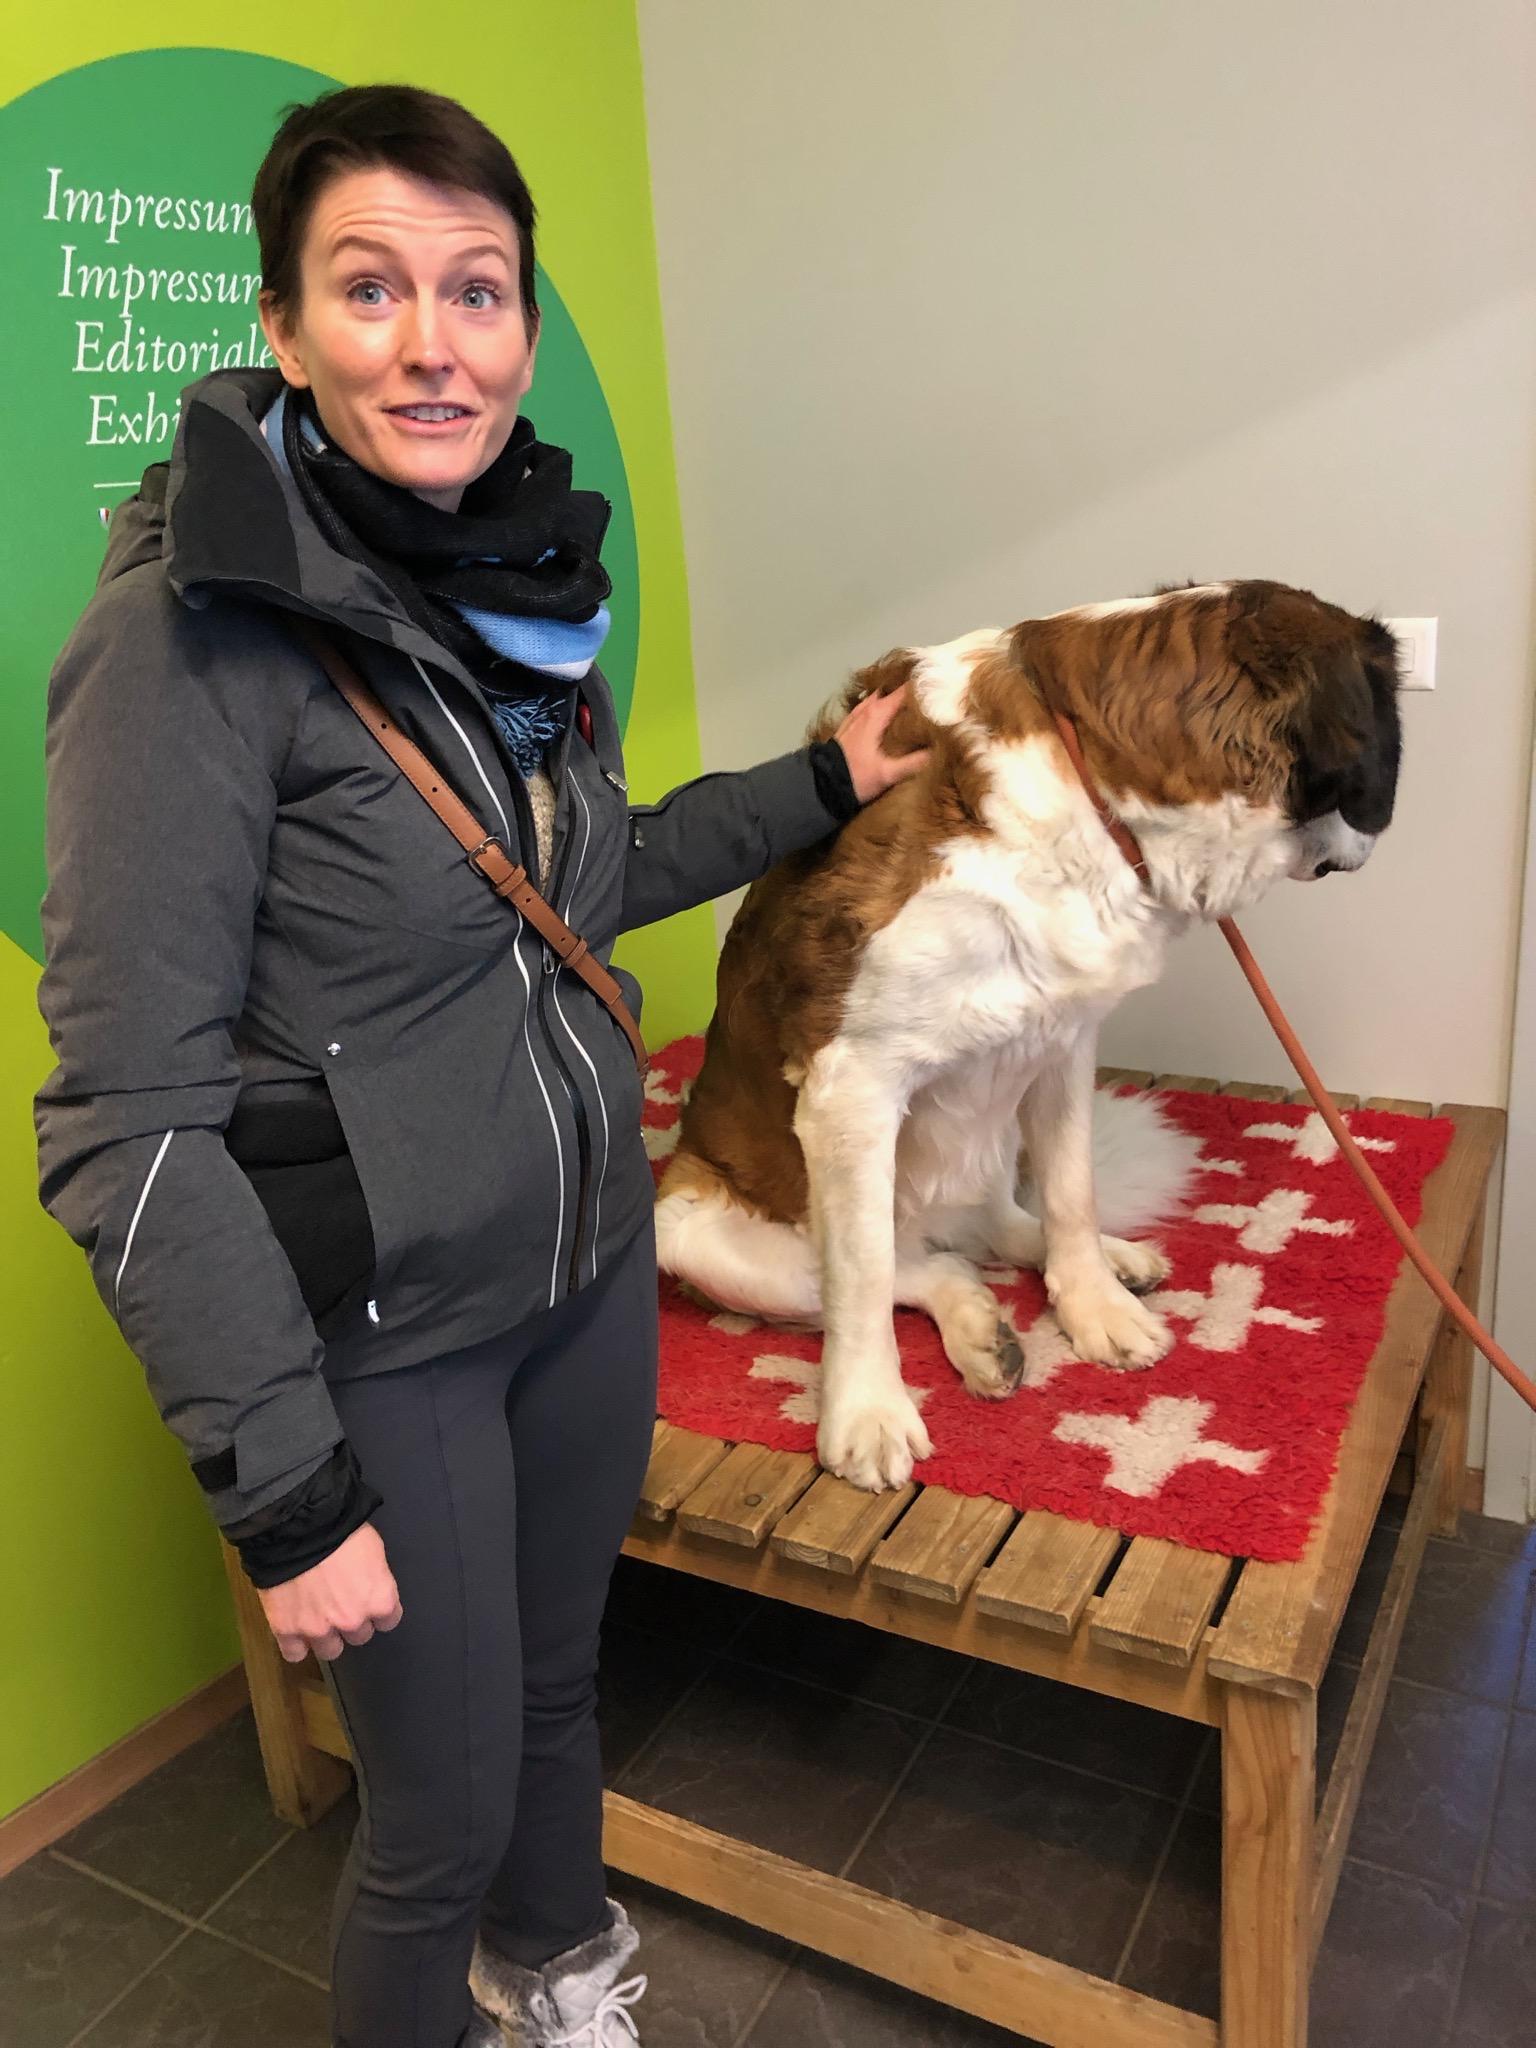 Proof of the petting. Barryland in Martigny, Switzerland, December 2018.